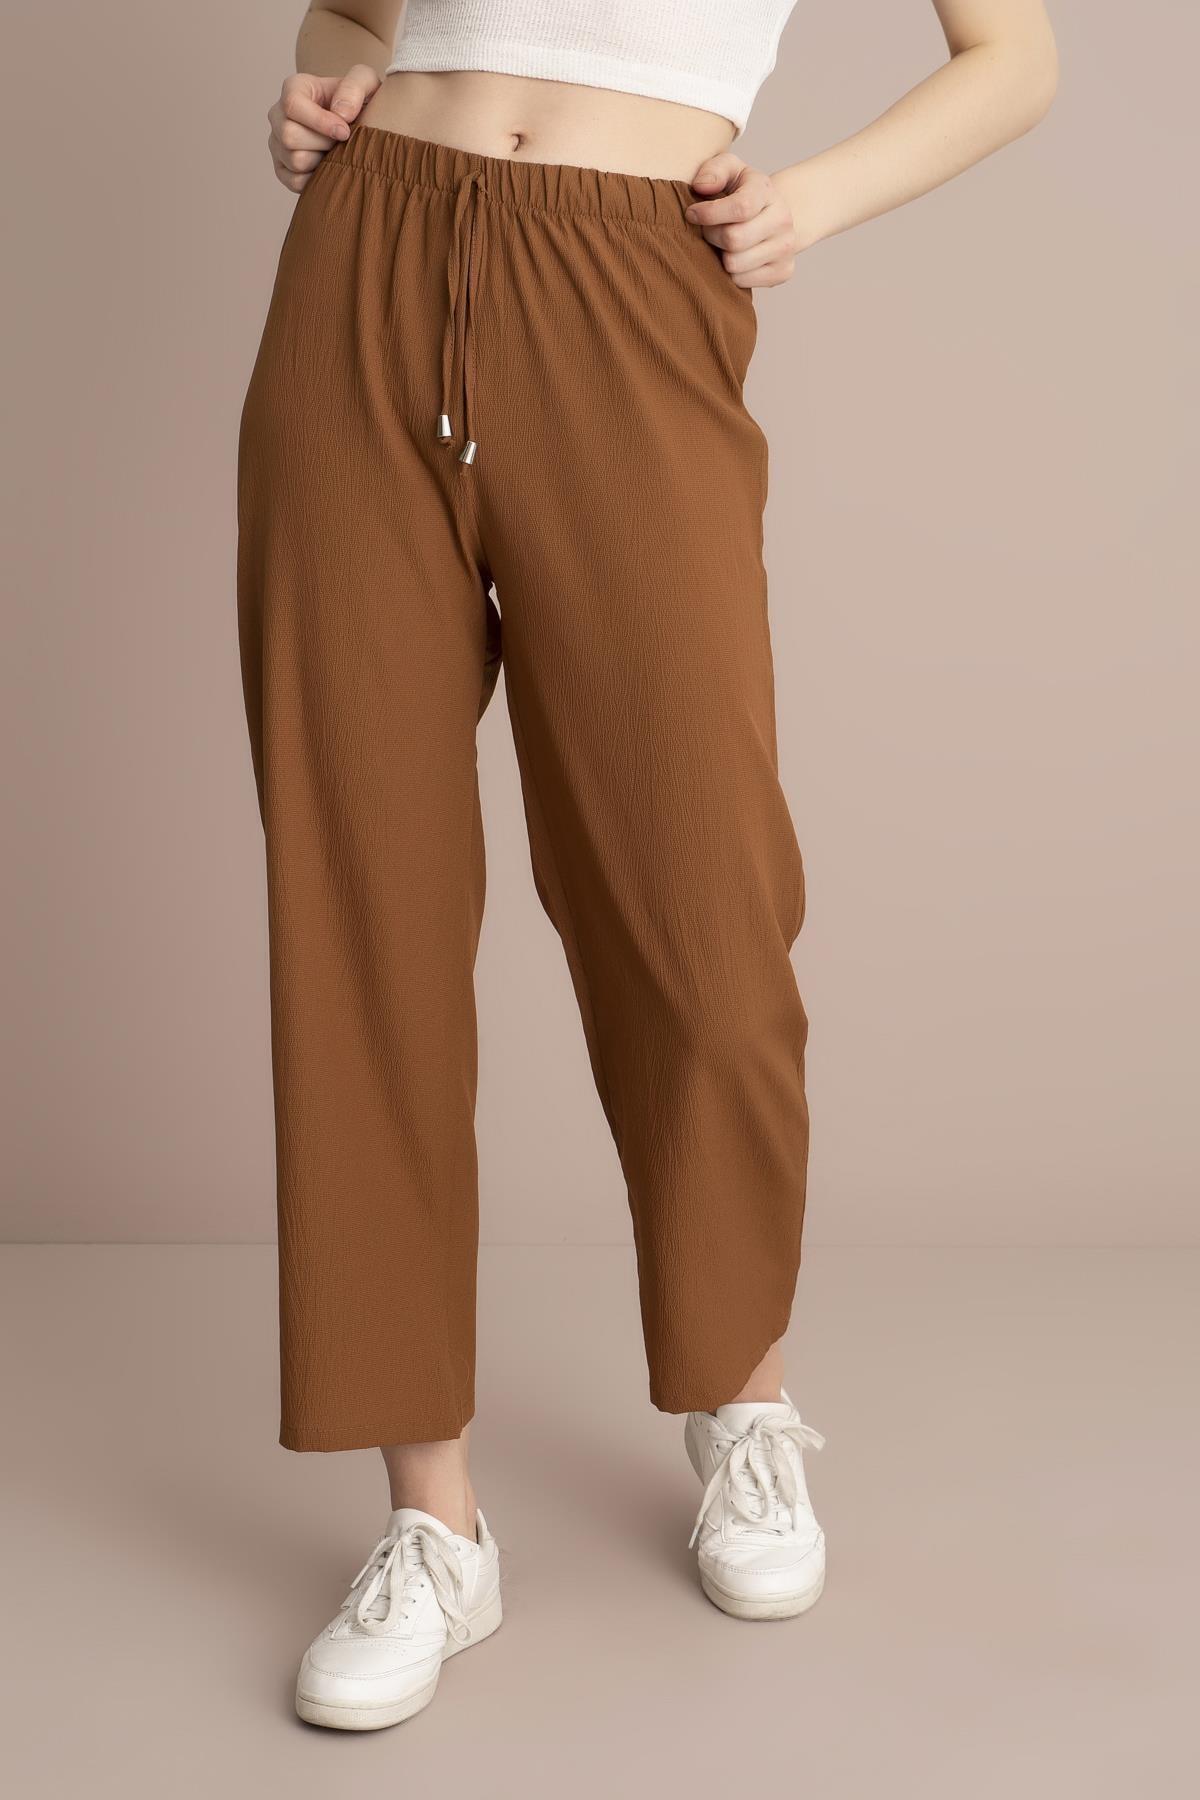 TENA MODA Kadın Tarçın Bel Lastikli Bol Paça Pantolon 2